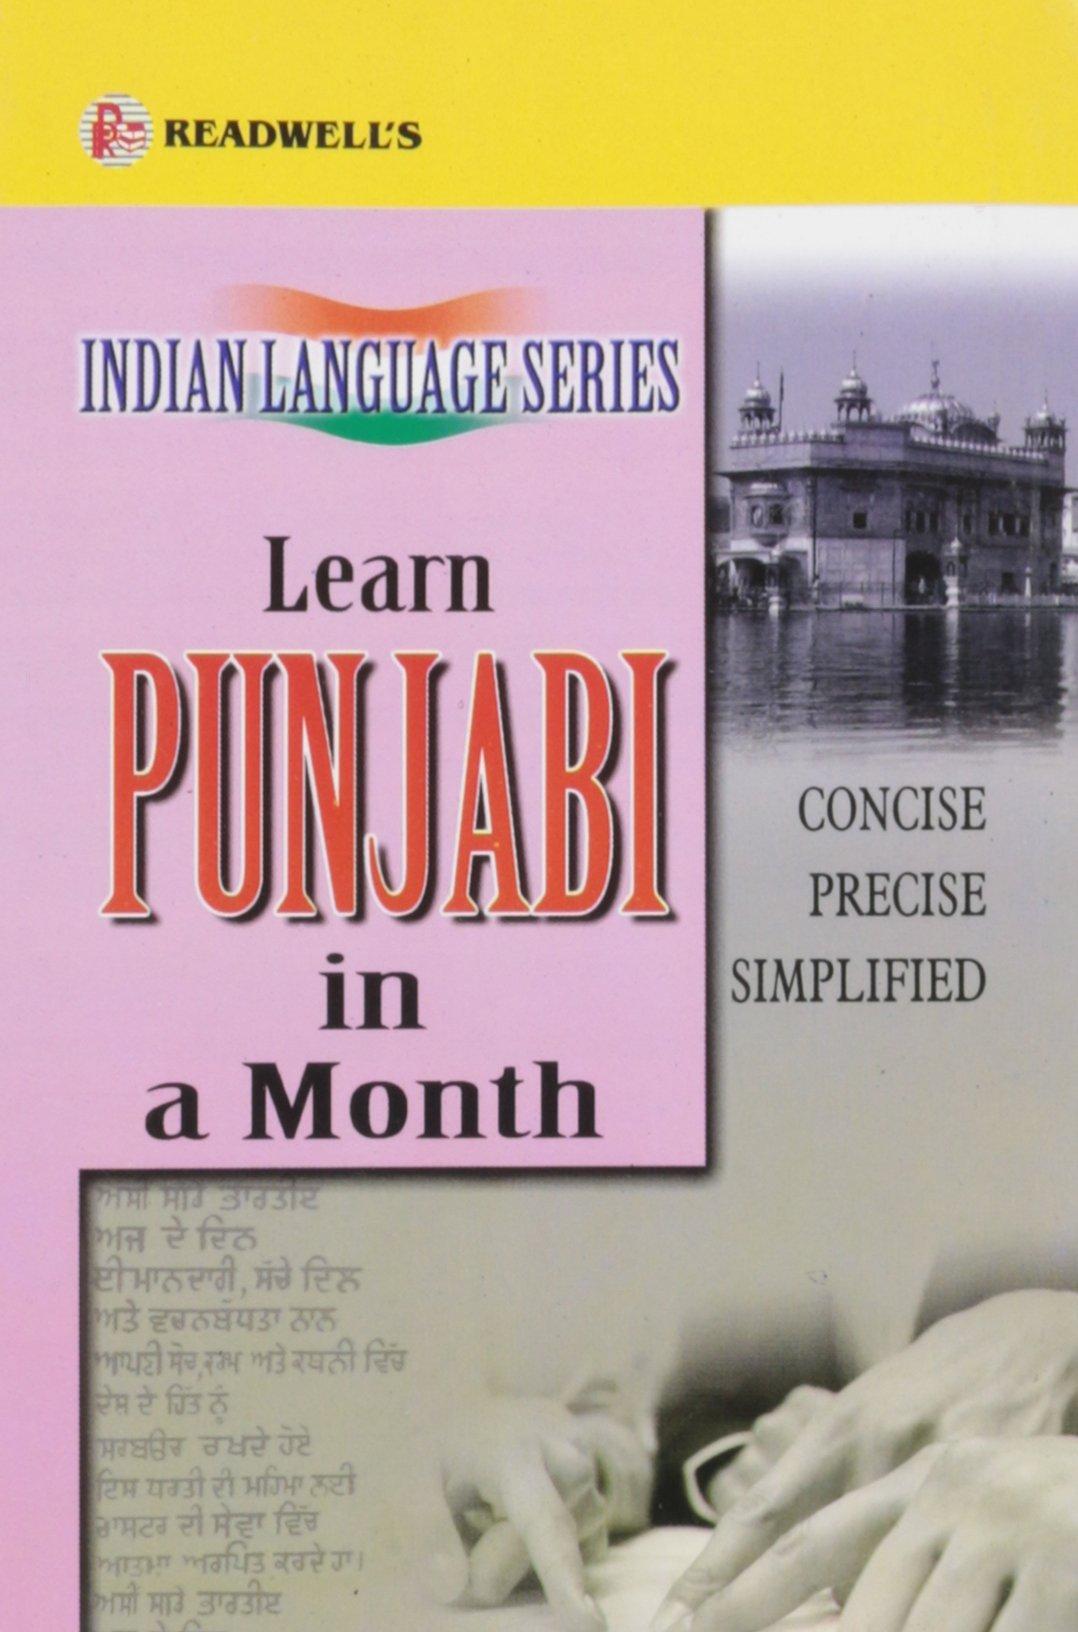 Buy Learn Punjabi in a Month (Indian Language Series) Book